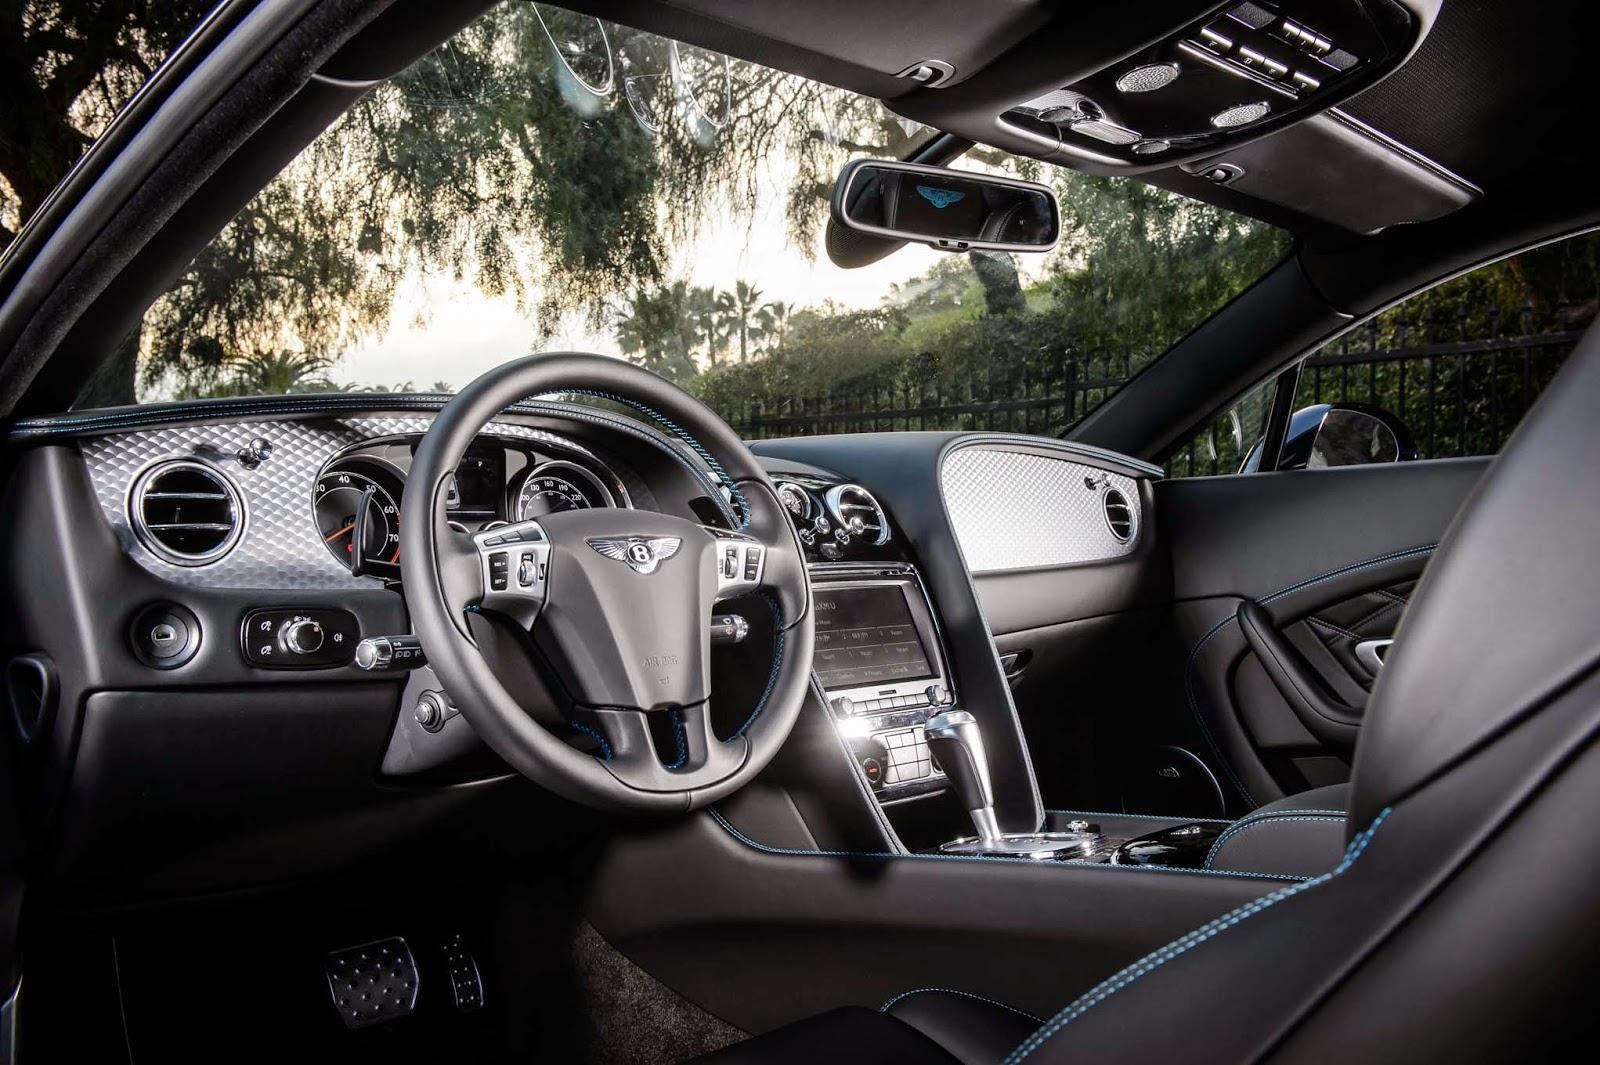 Bentley Continental GT V8 S Interior Image